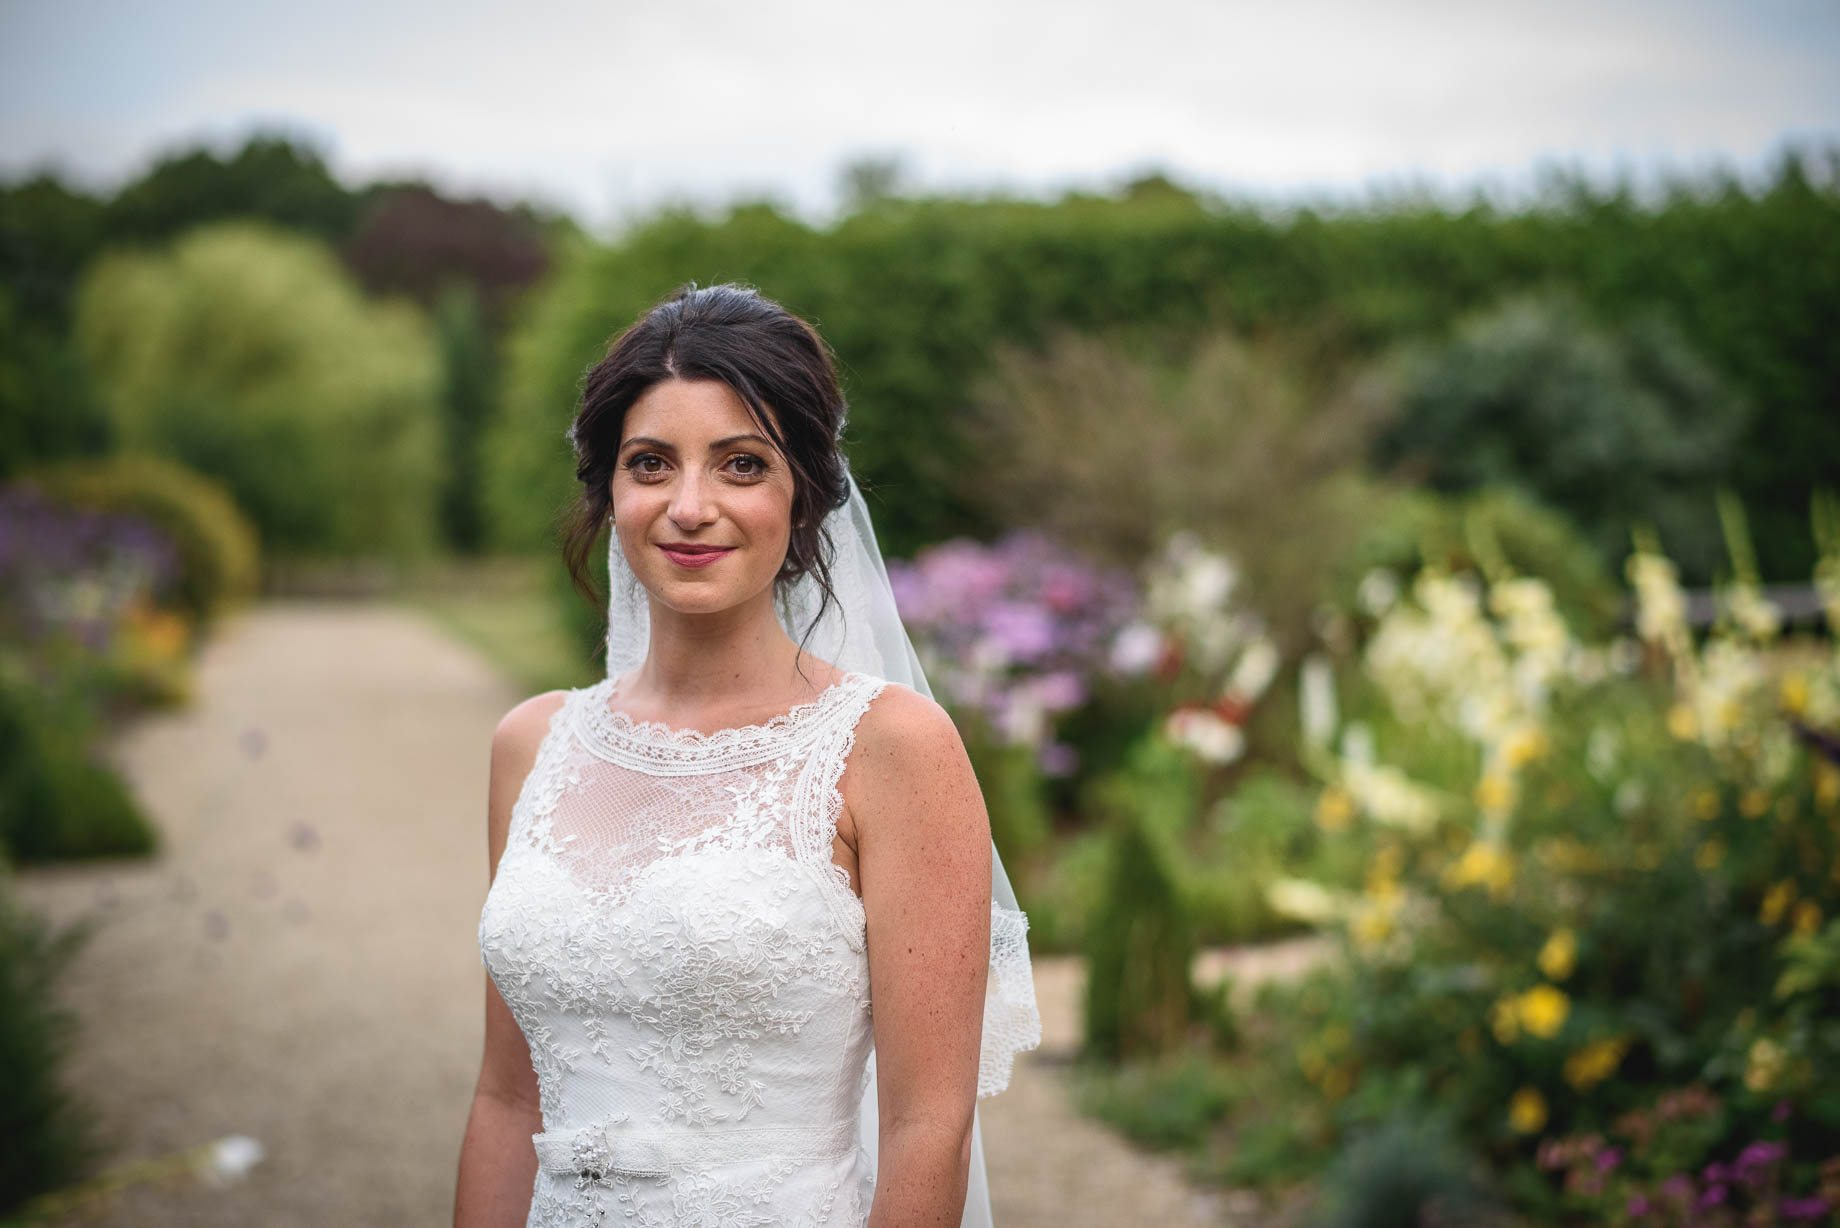 Gaynes Park wedding photography - Guy Collier Photography - Rachel and Jon (141 of 169)